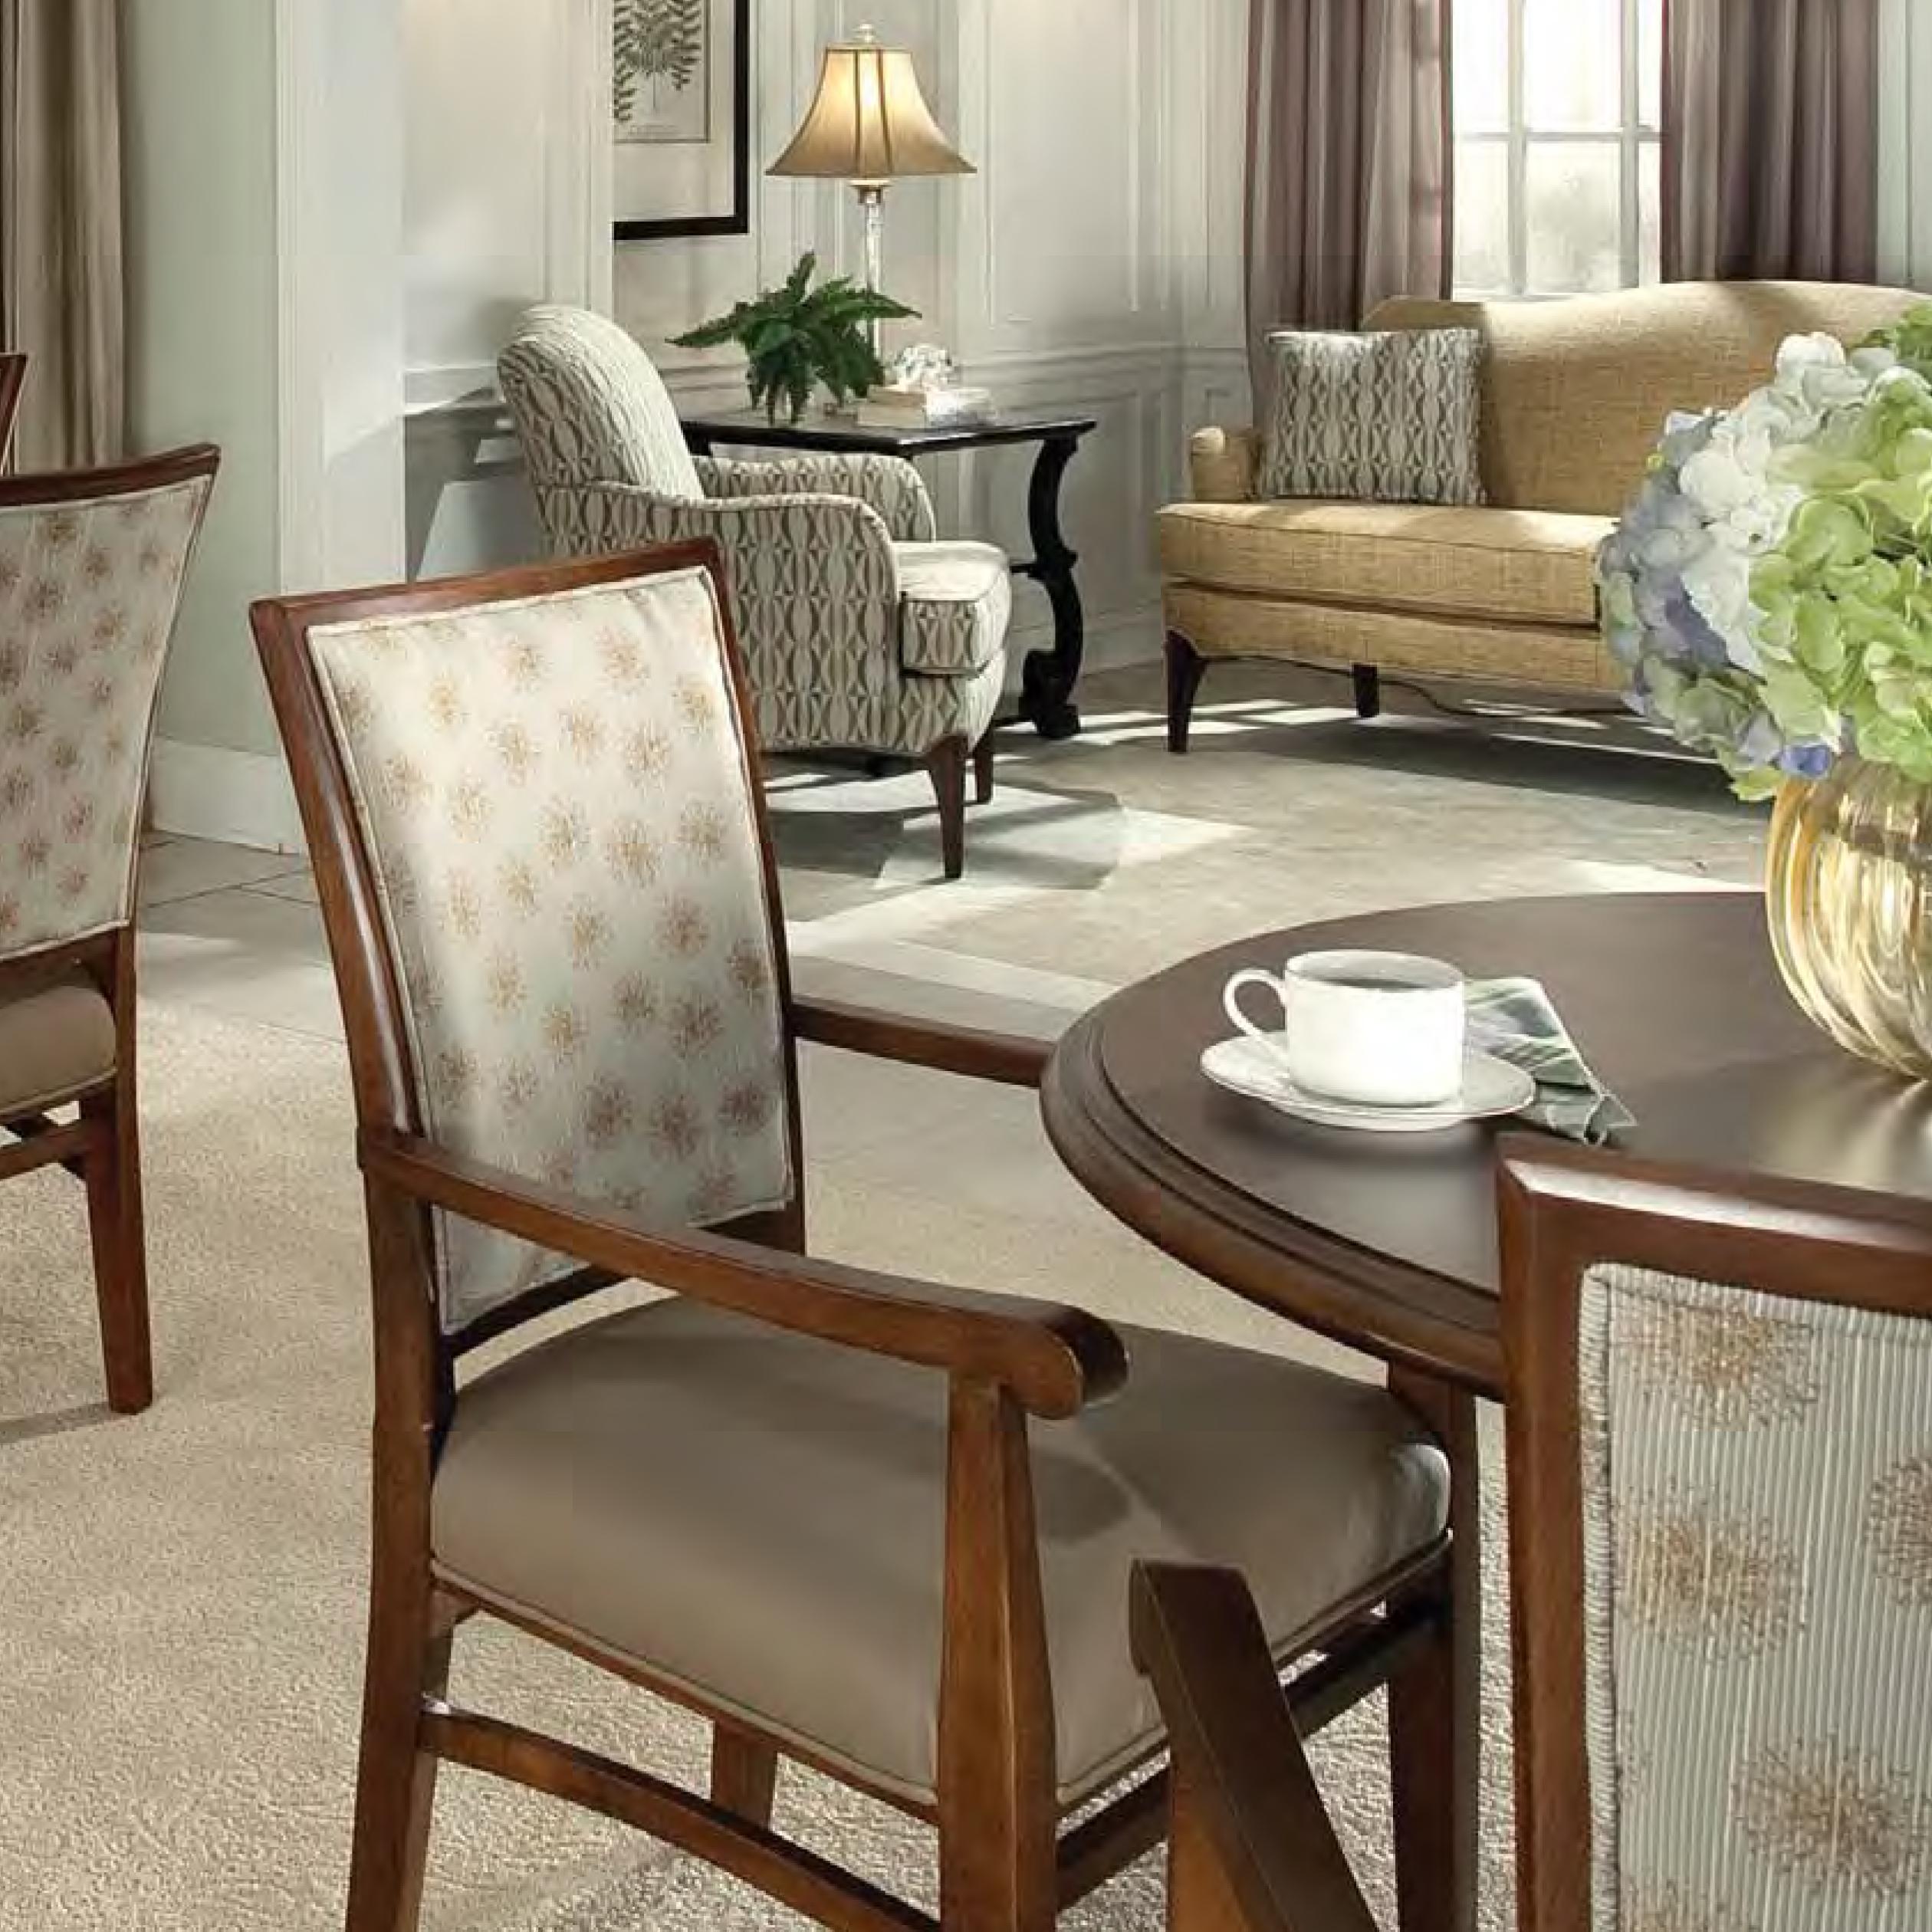 ... Skilled Nursing Furniture Senior Living Dining Chair, Senior  Furnishings, Assisted Living Dining Chair ...